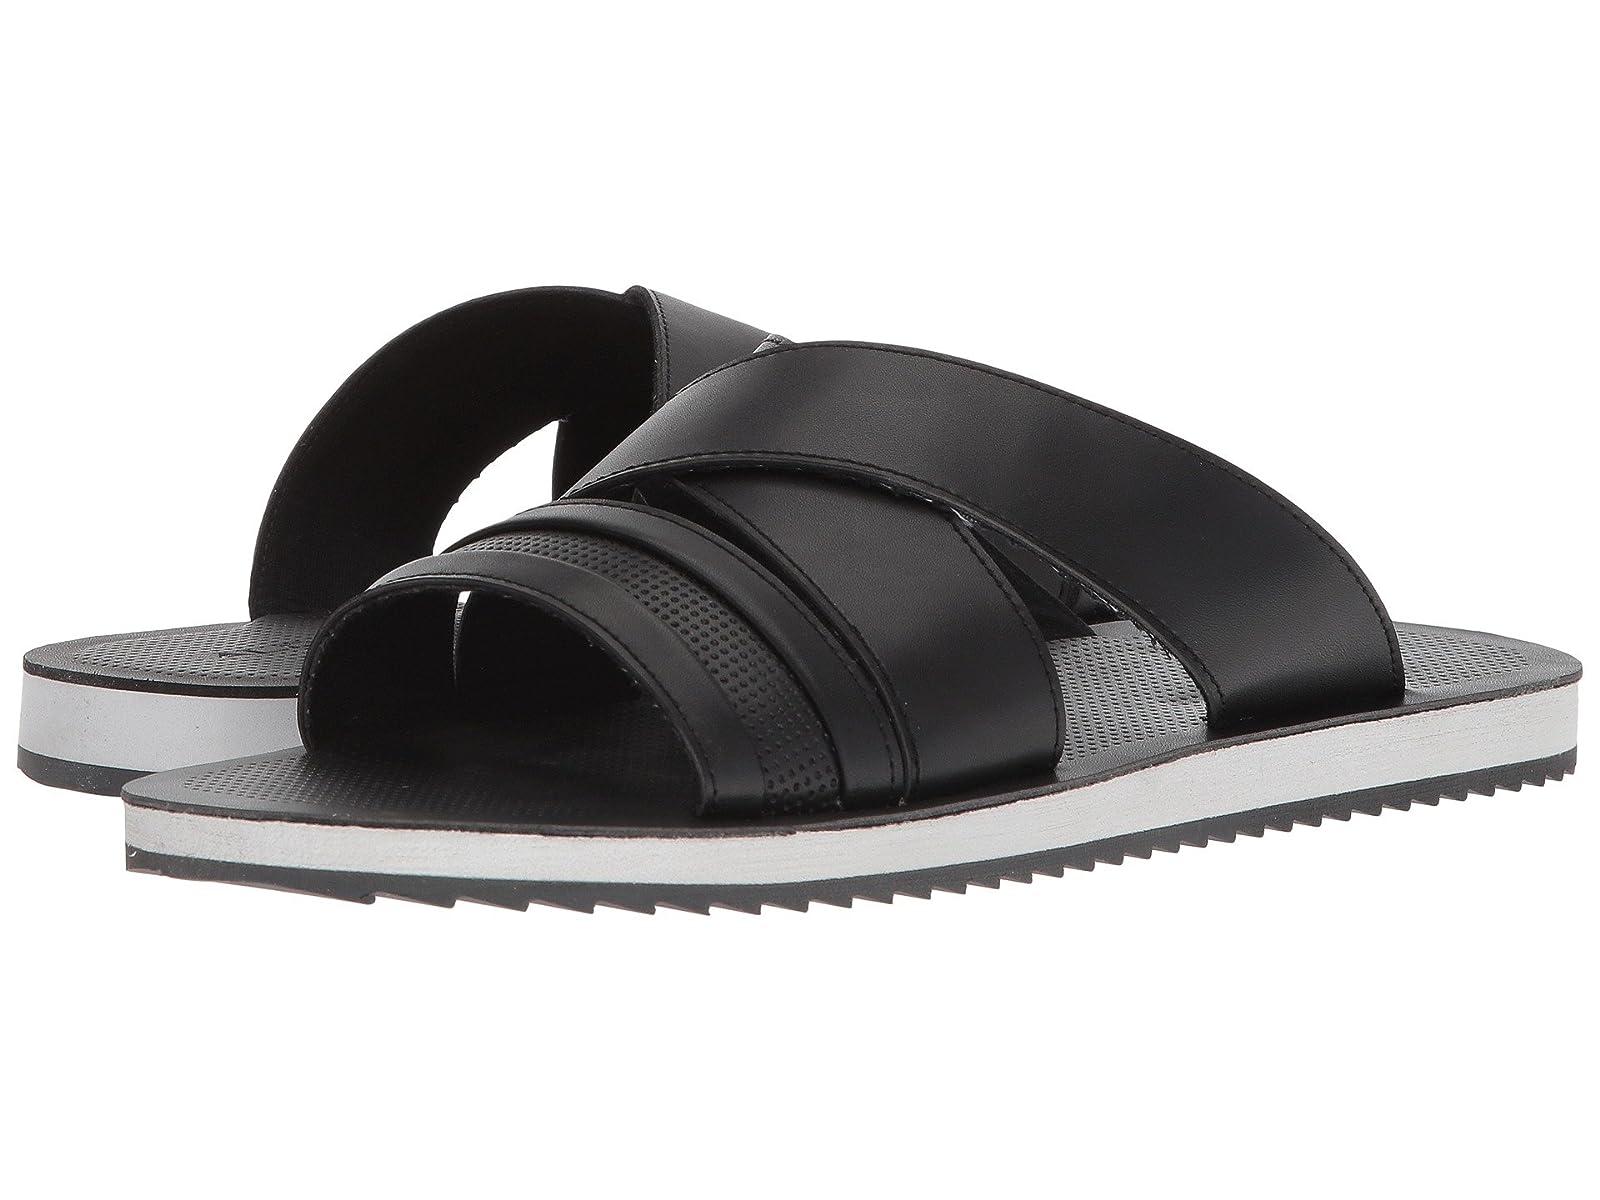 ALDO AgreillanAtmospheric grades have affordable shoes